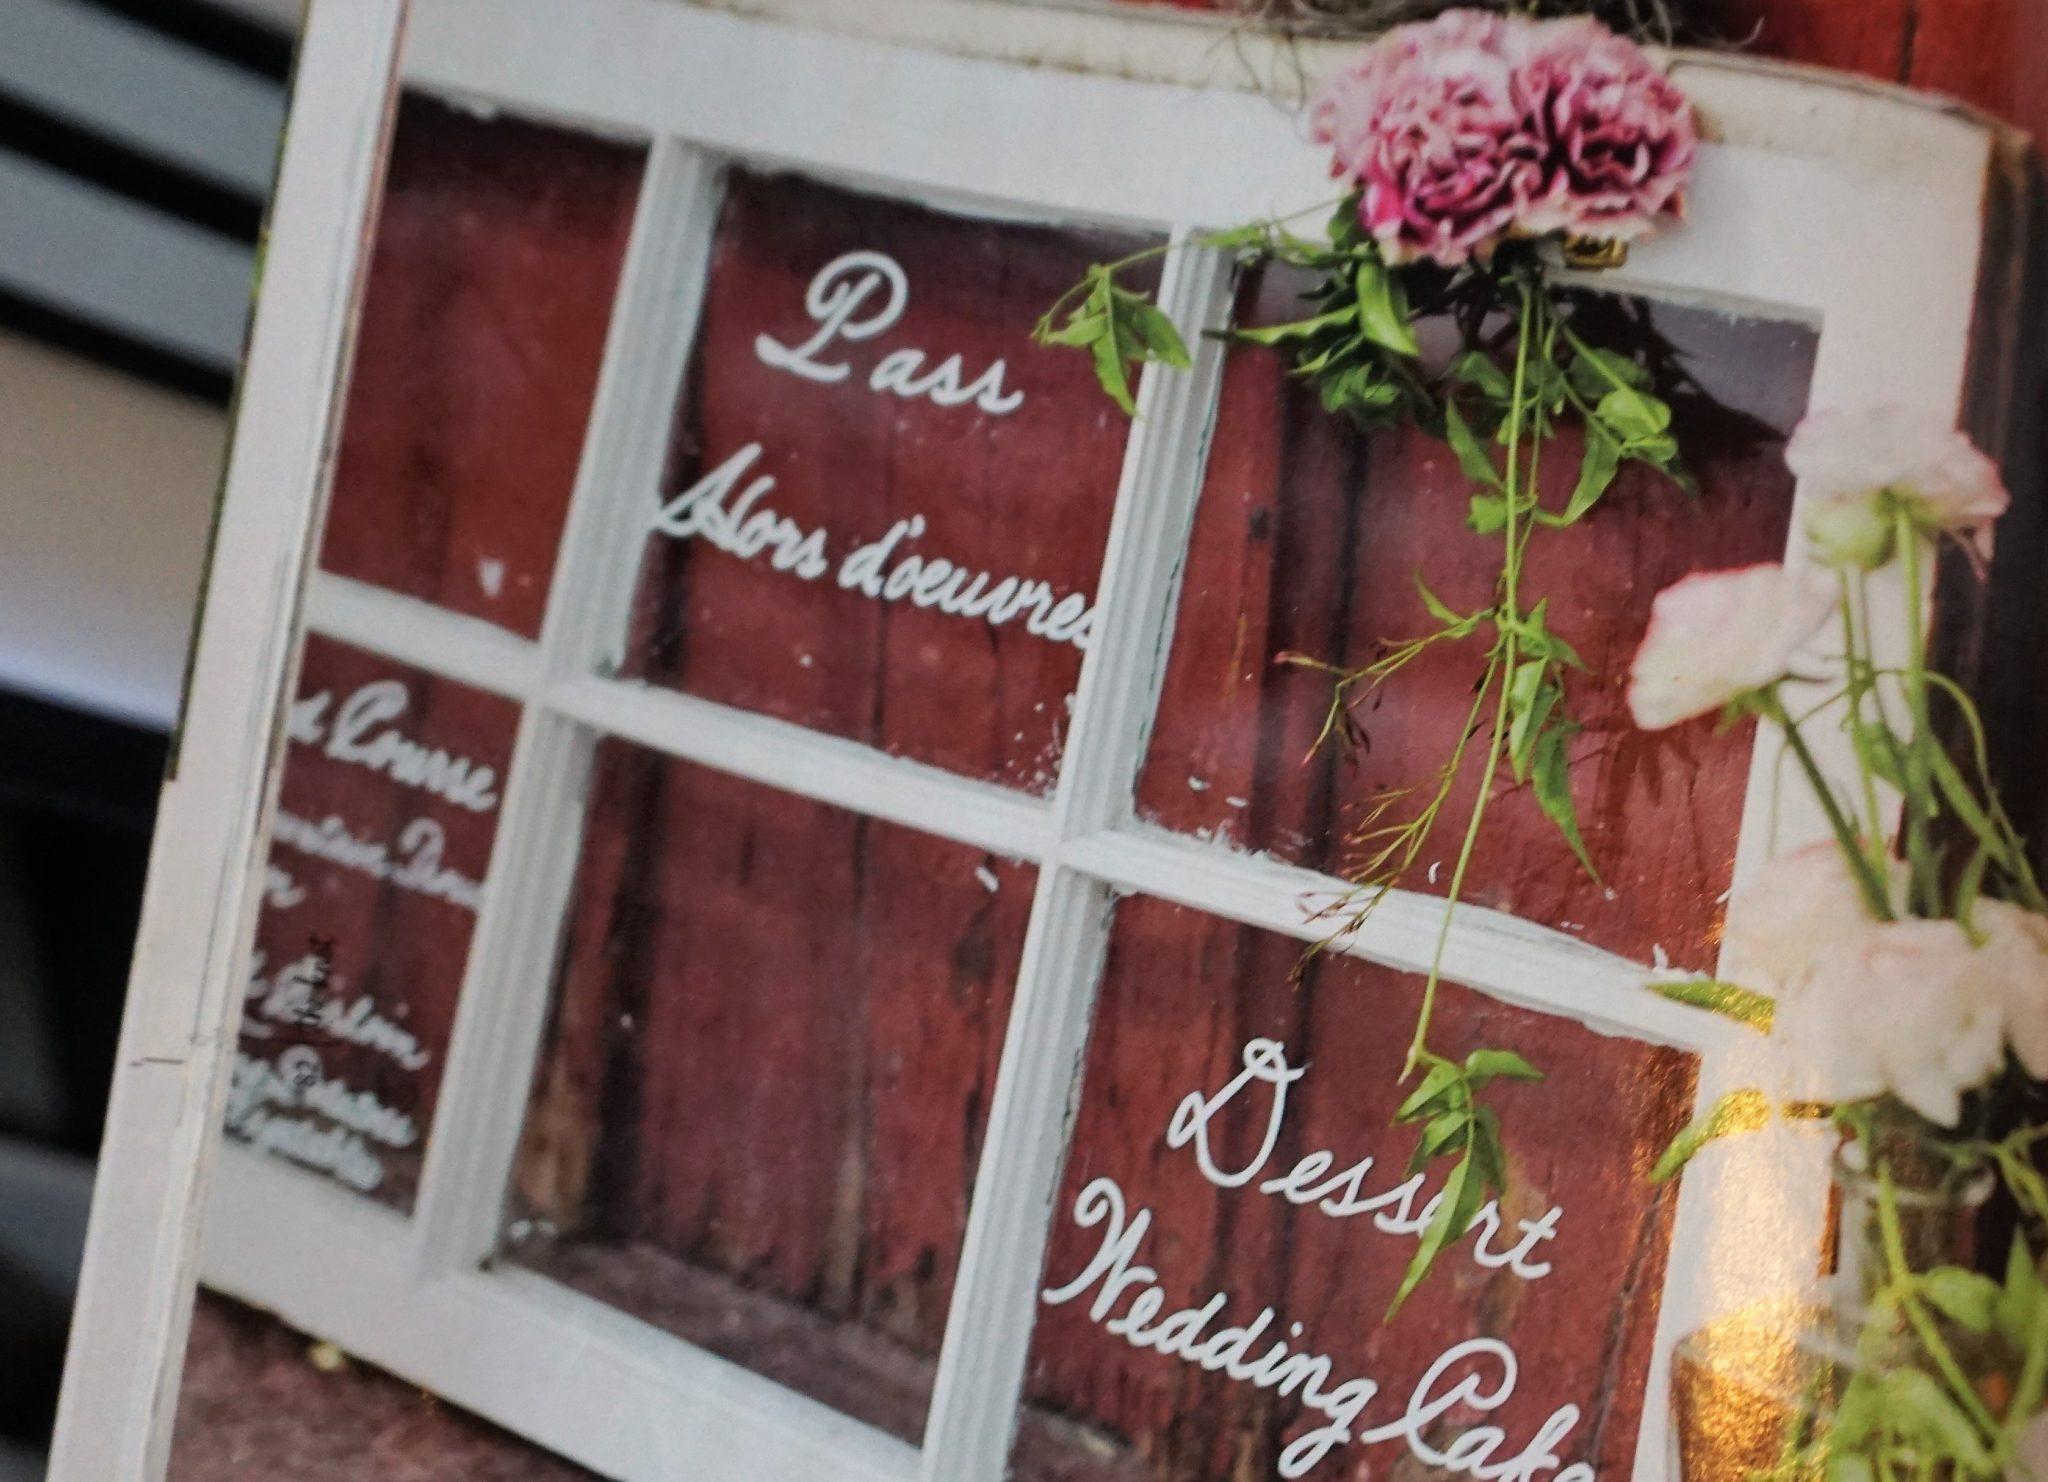 Handmade wedding sign on window